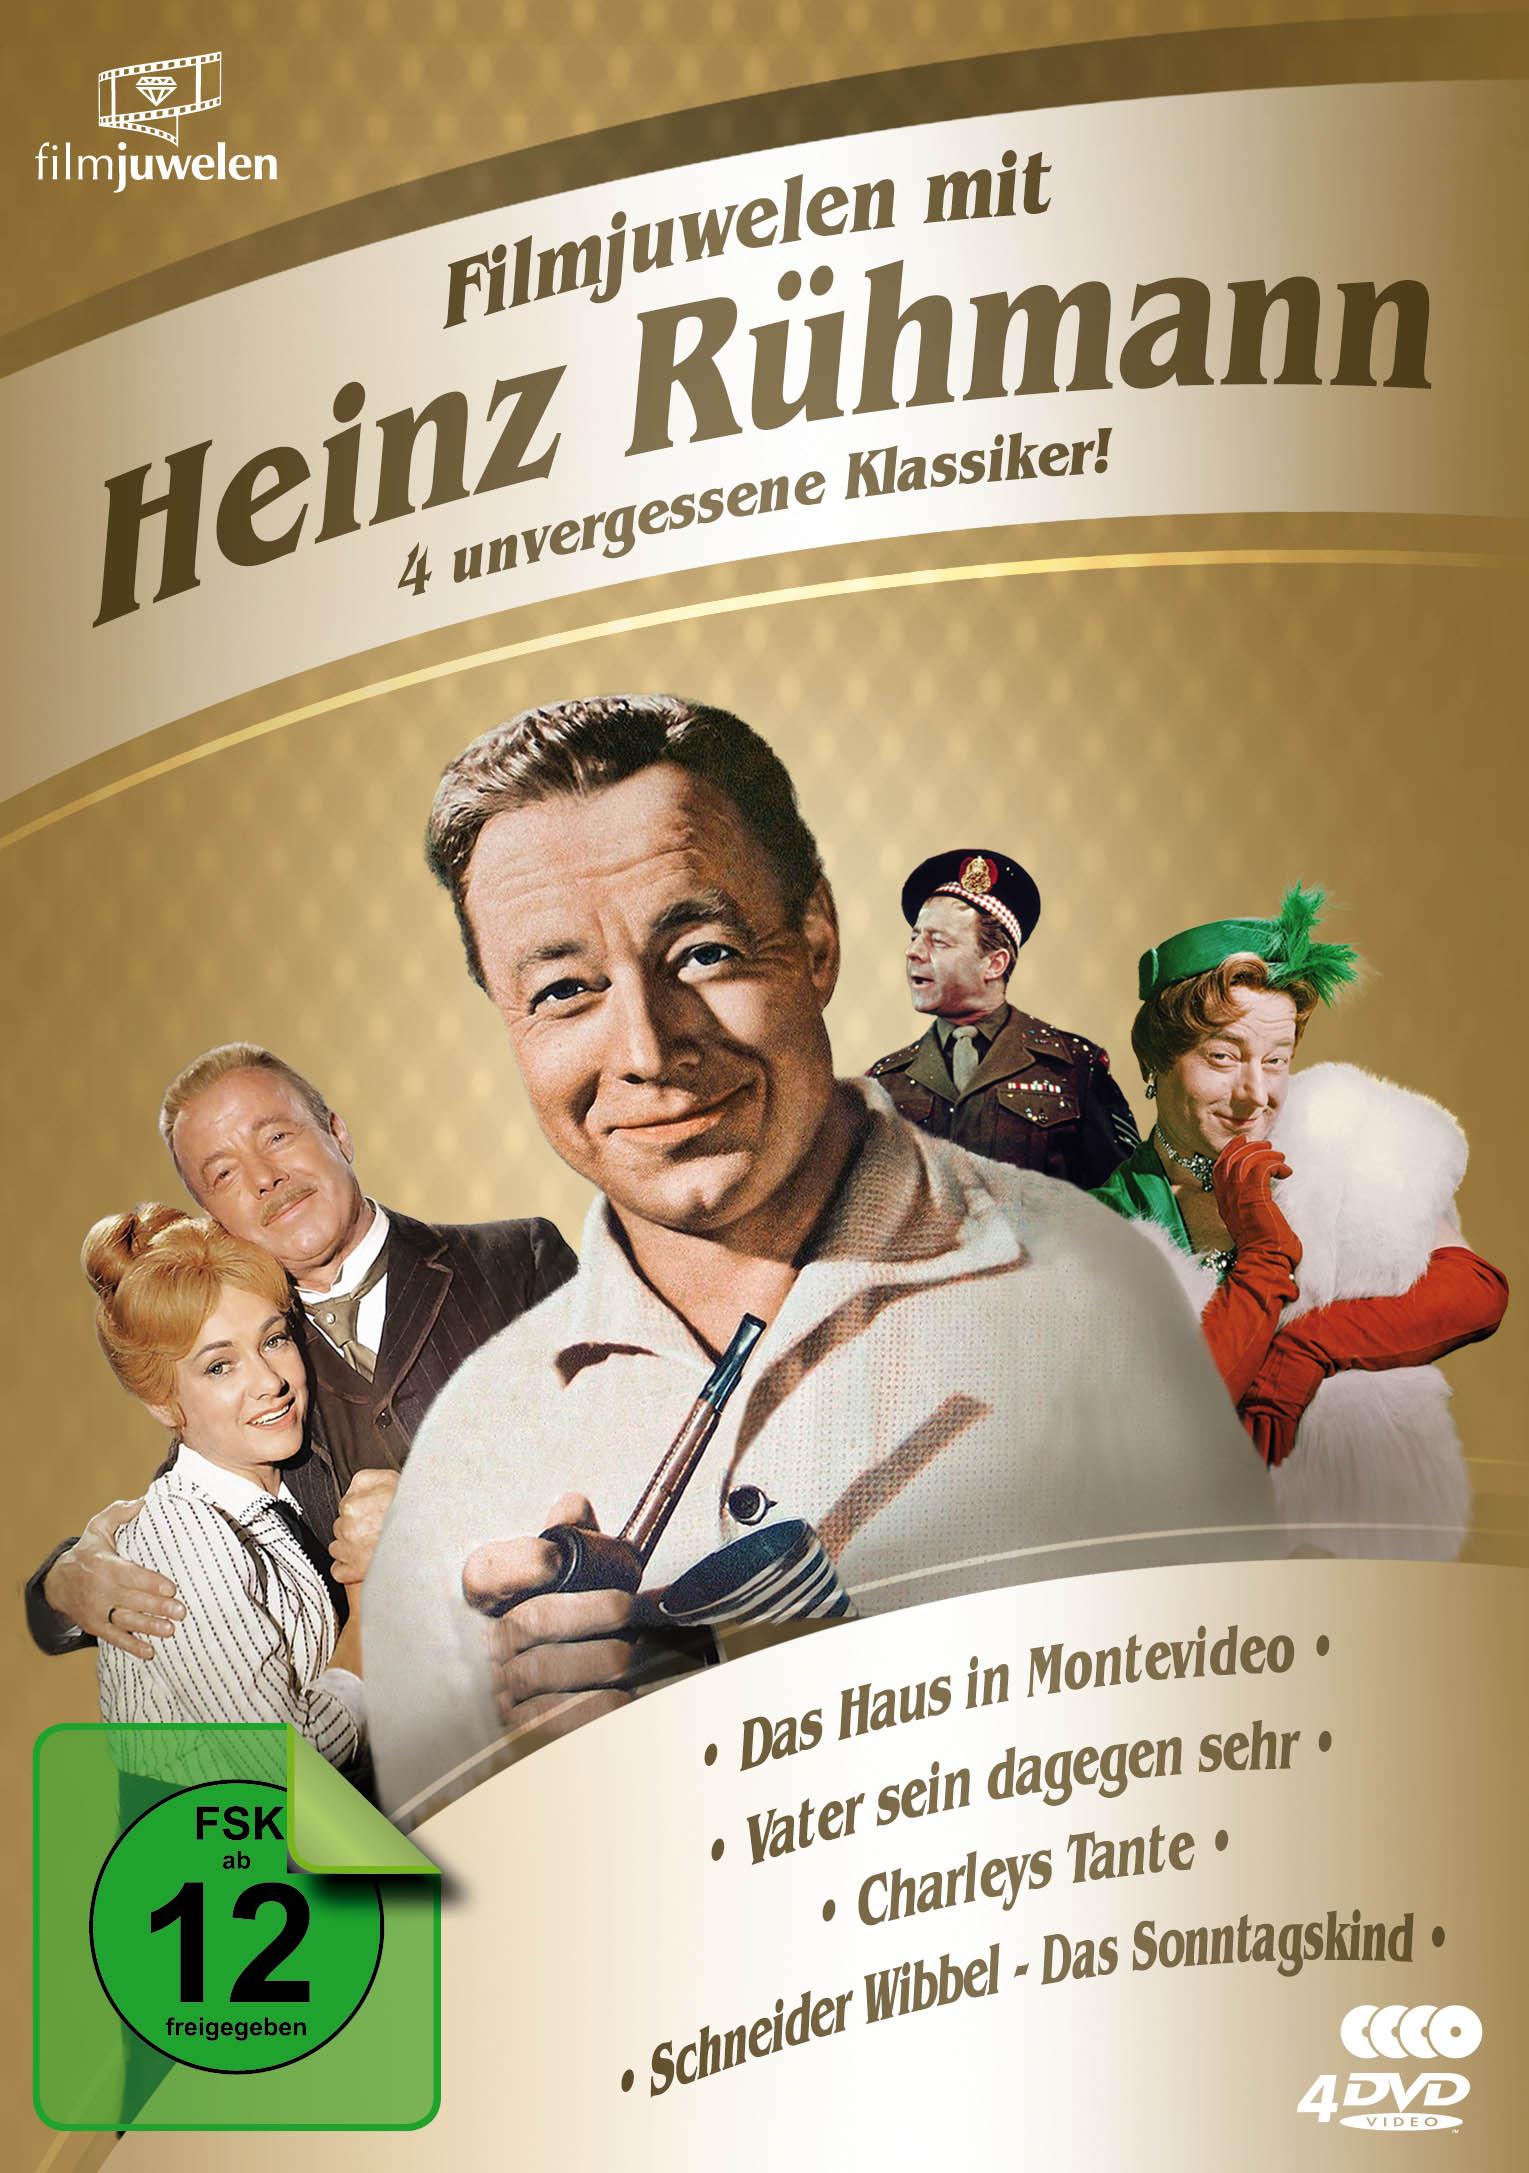 Komplette Tante Serie Neffe Die Sopranos: